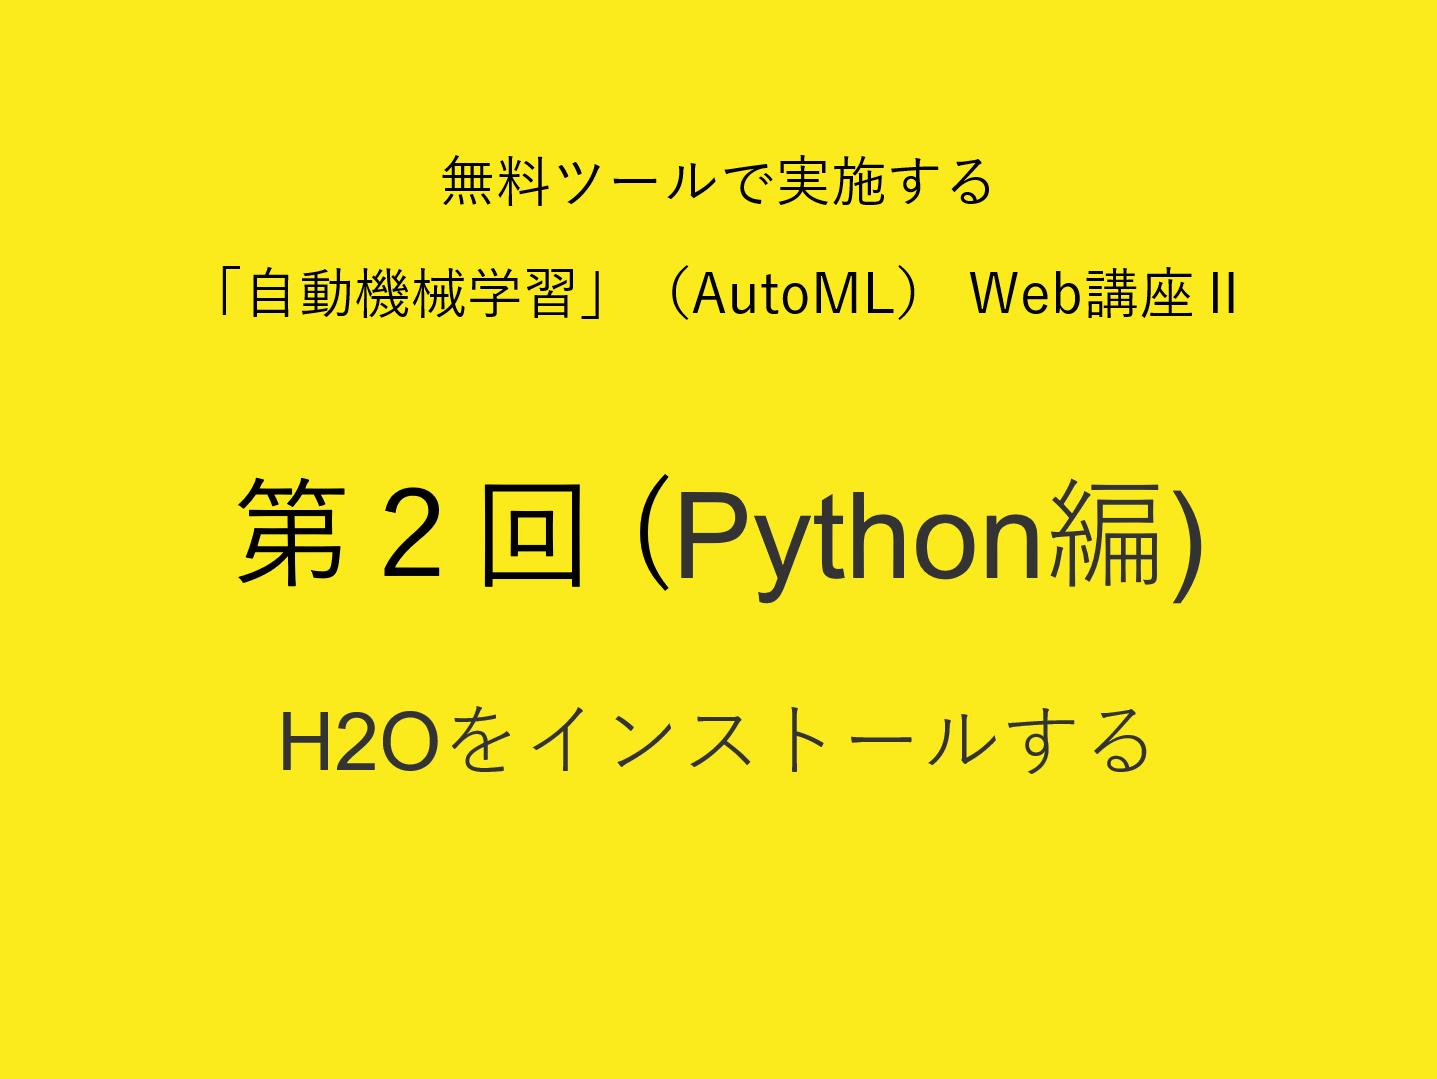 H2Oをインストールする(Python編)